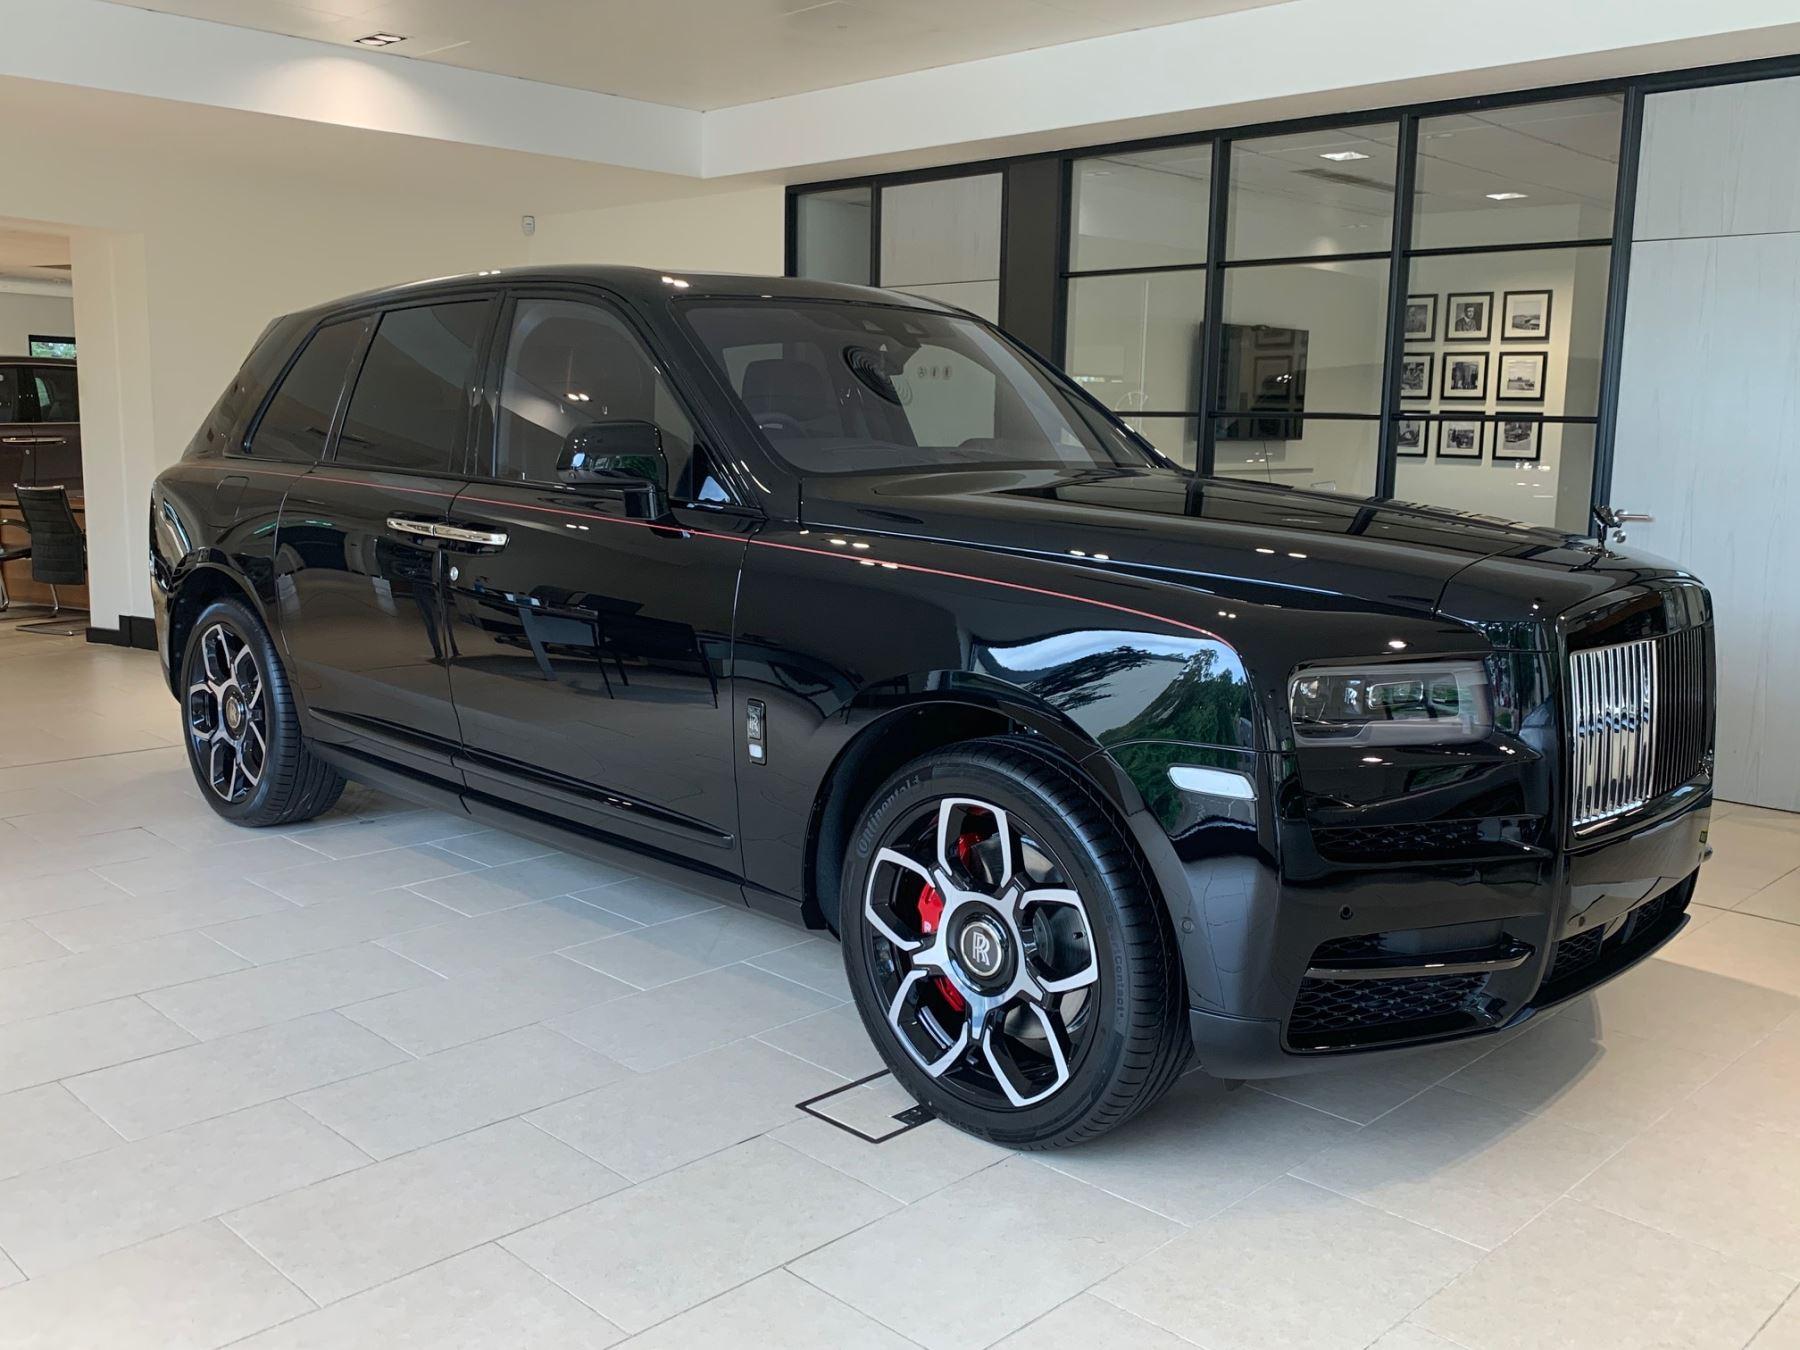 Rolls-Royce Black Badge Cullinan Black Badge 5dr Auto 6.8 Automatic Estate (2020)